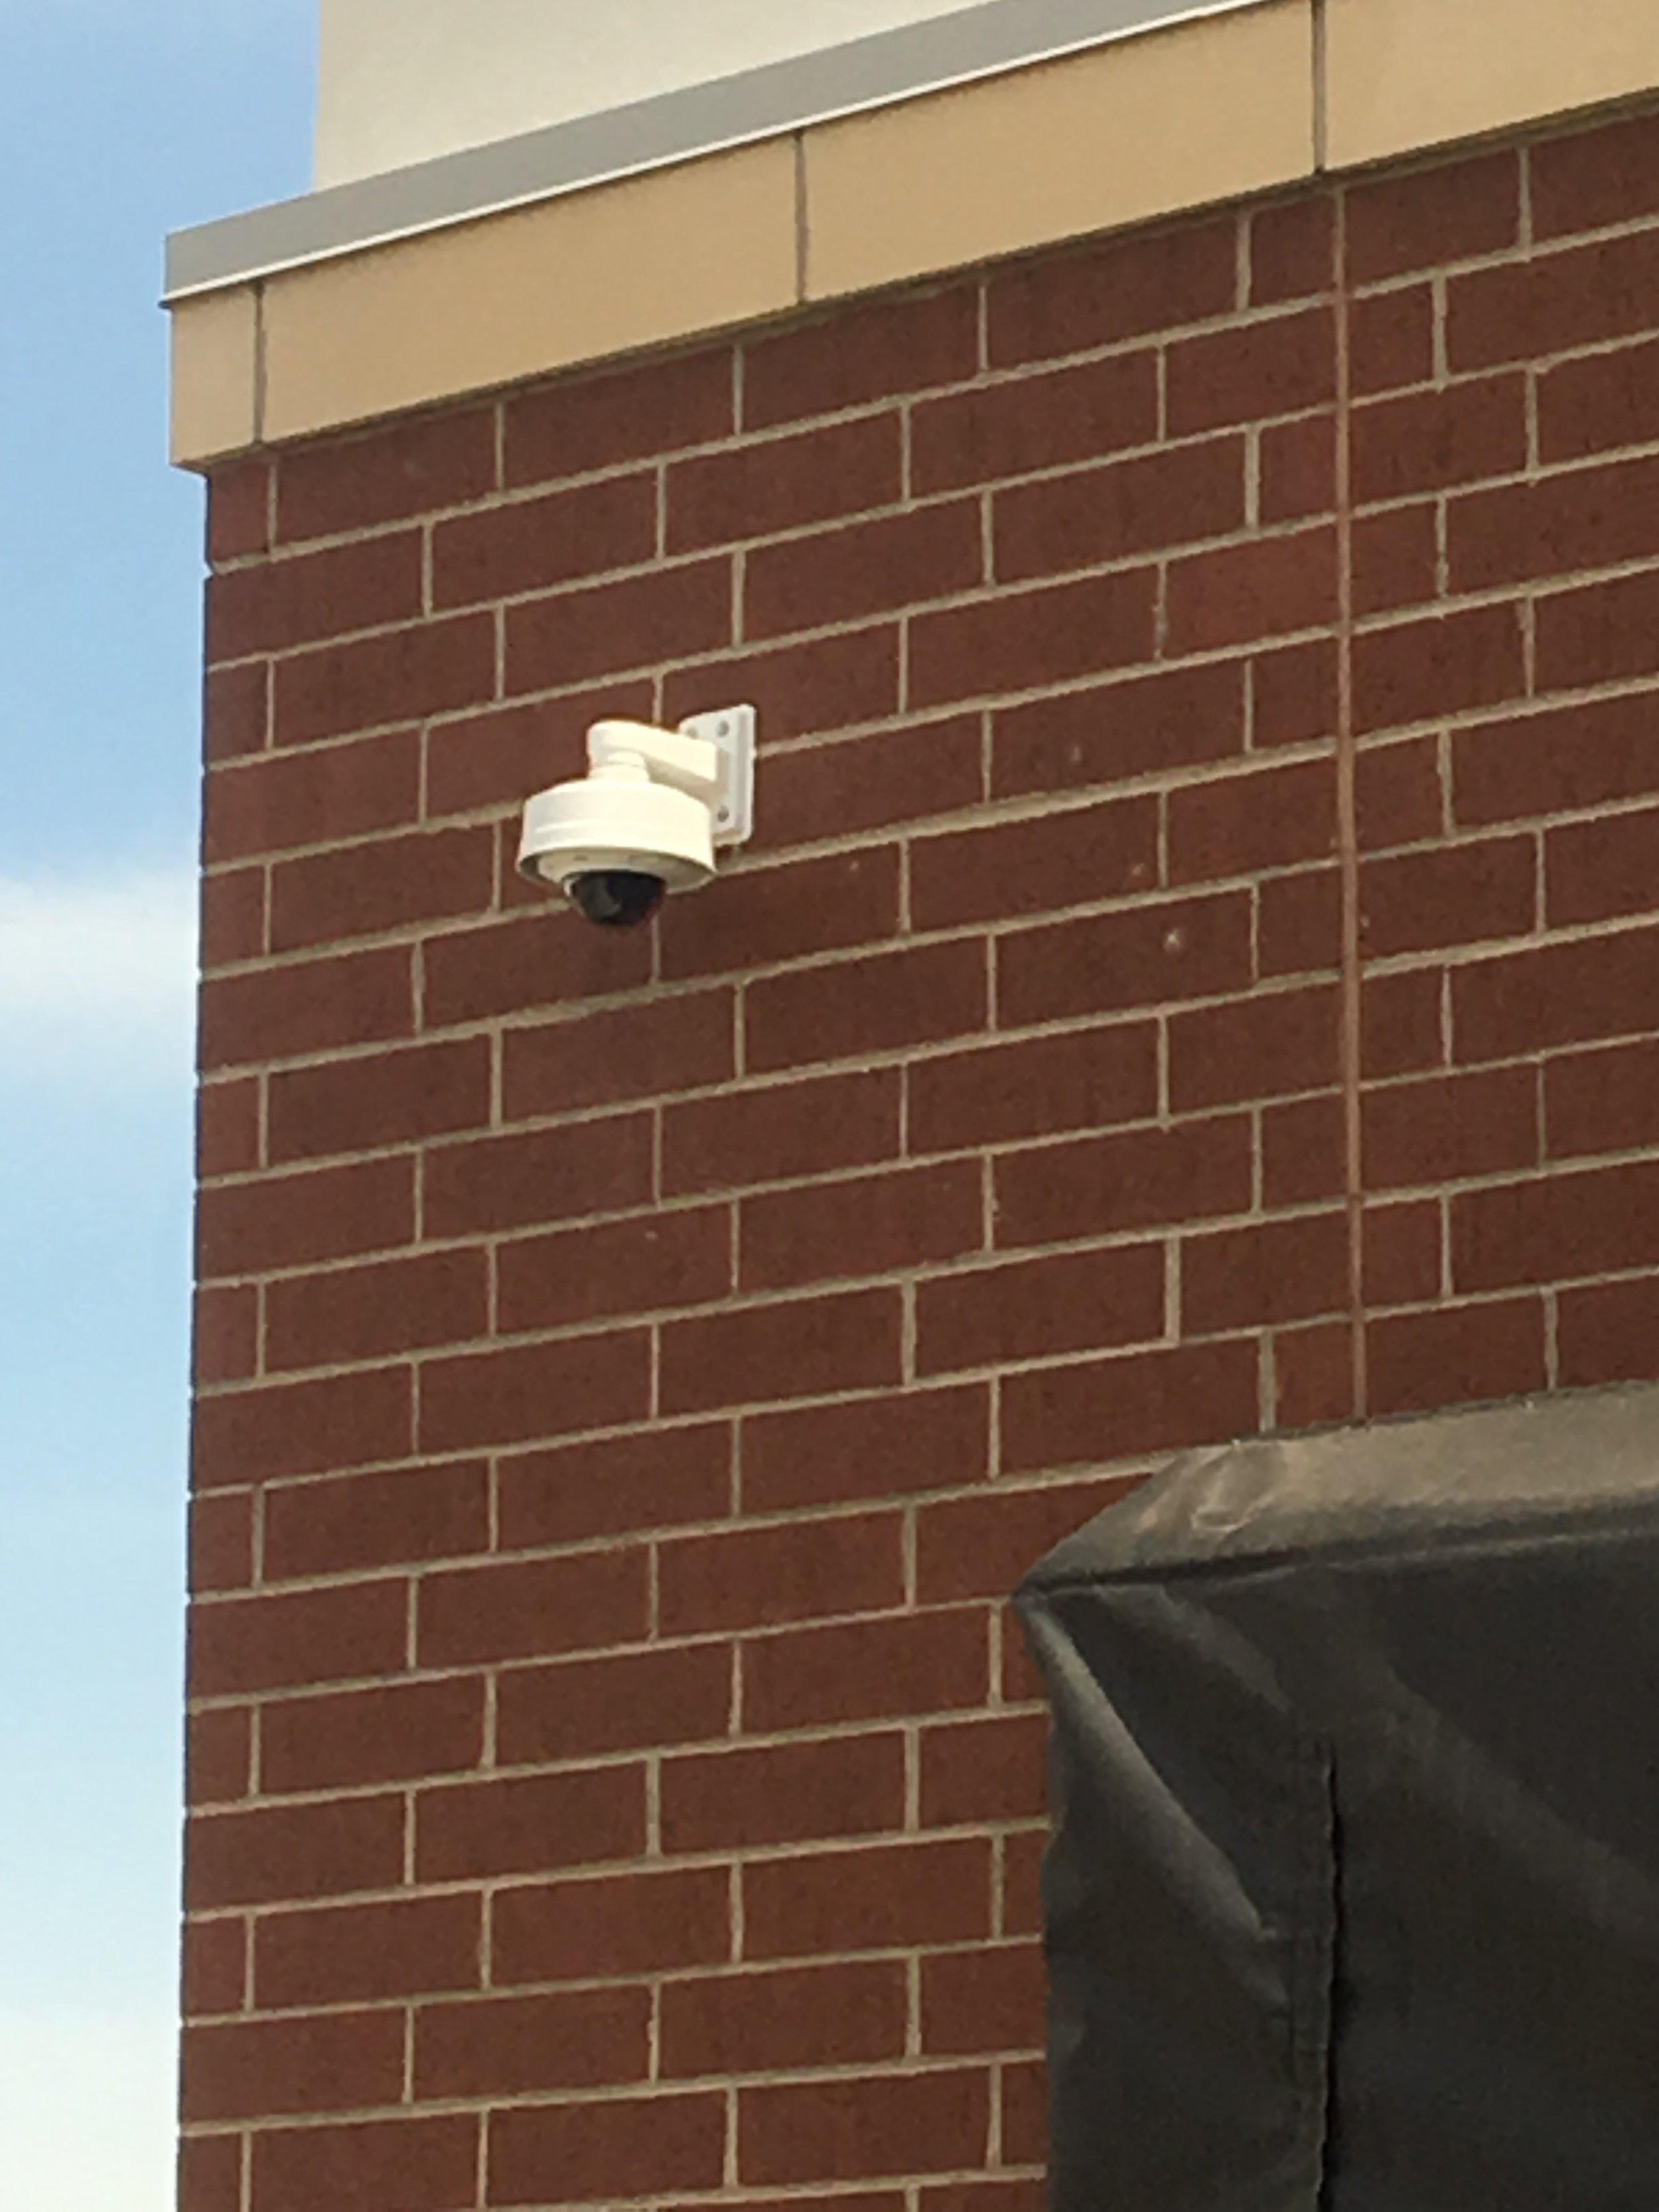 Exterior Axis Camera